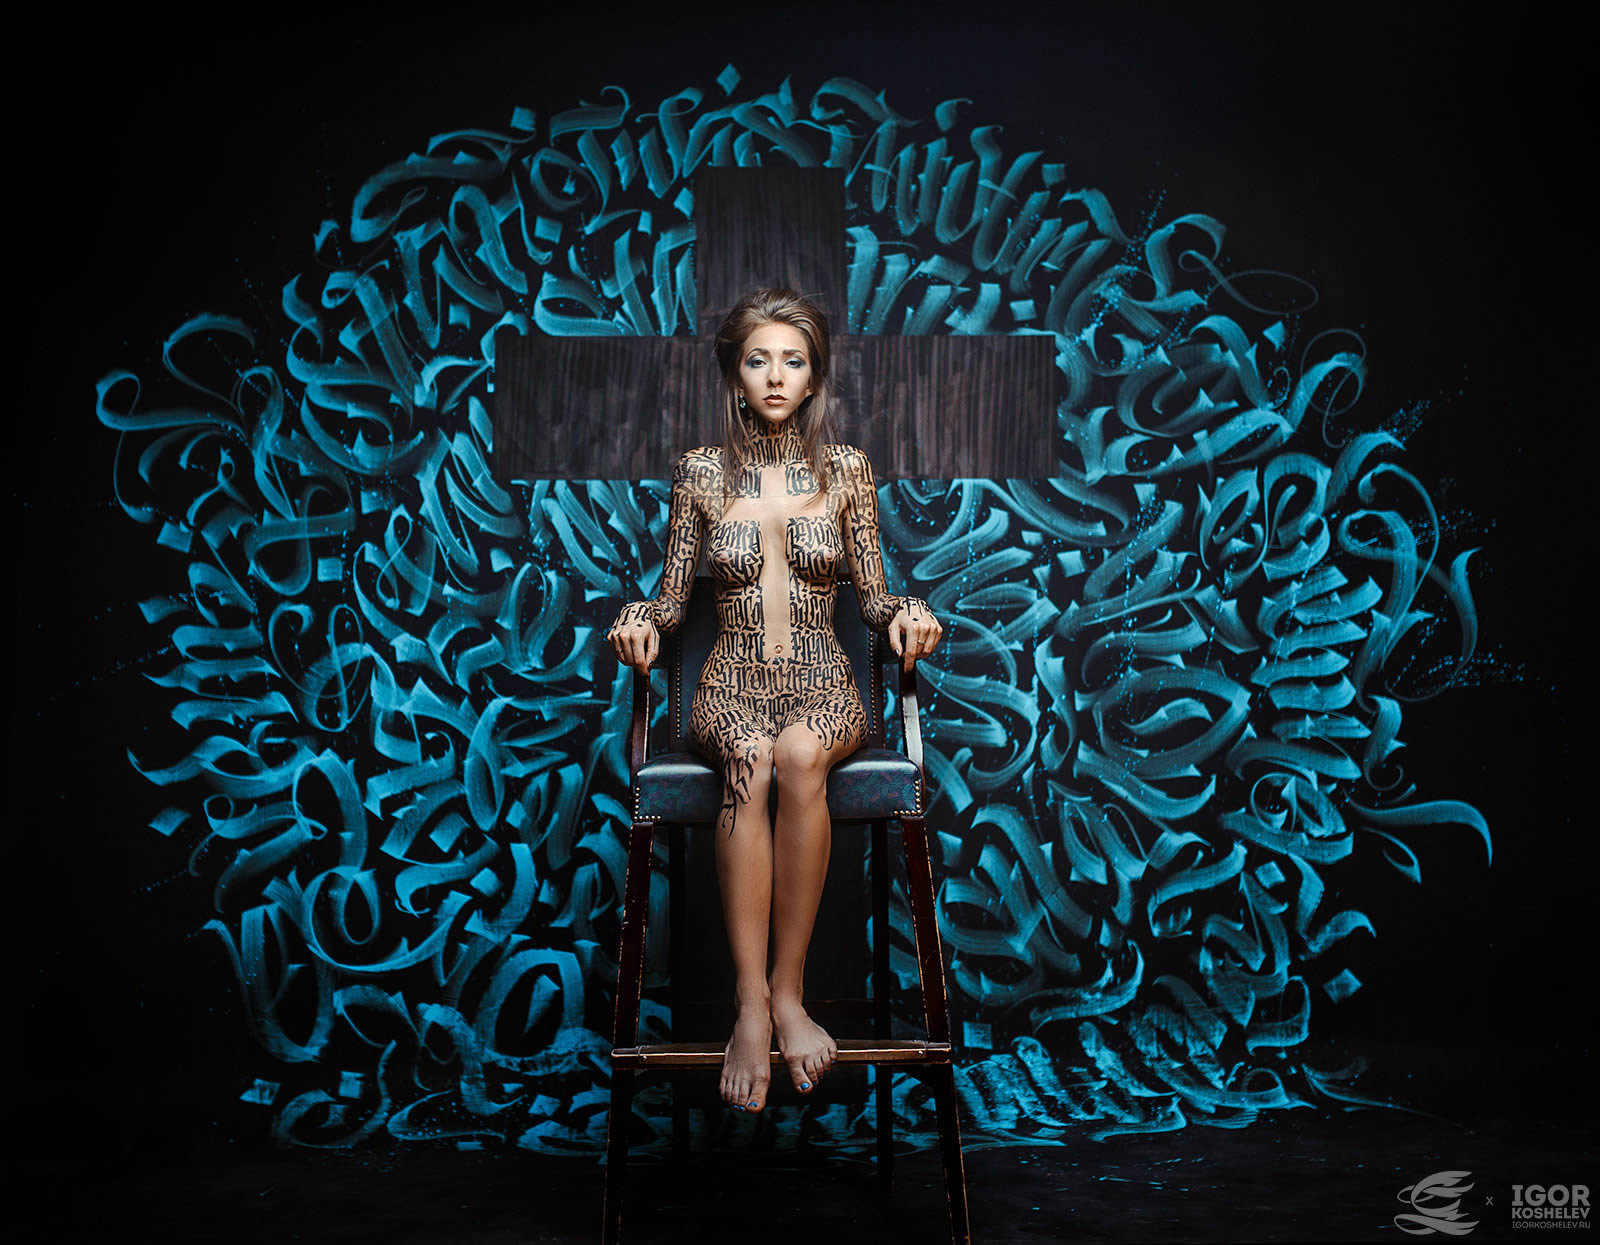 crossm calligraphy on girls, blue